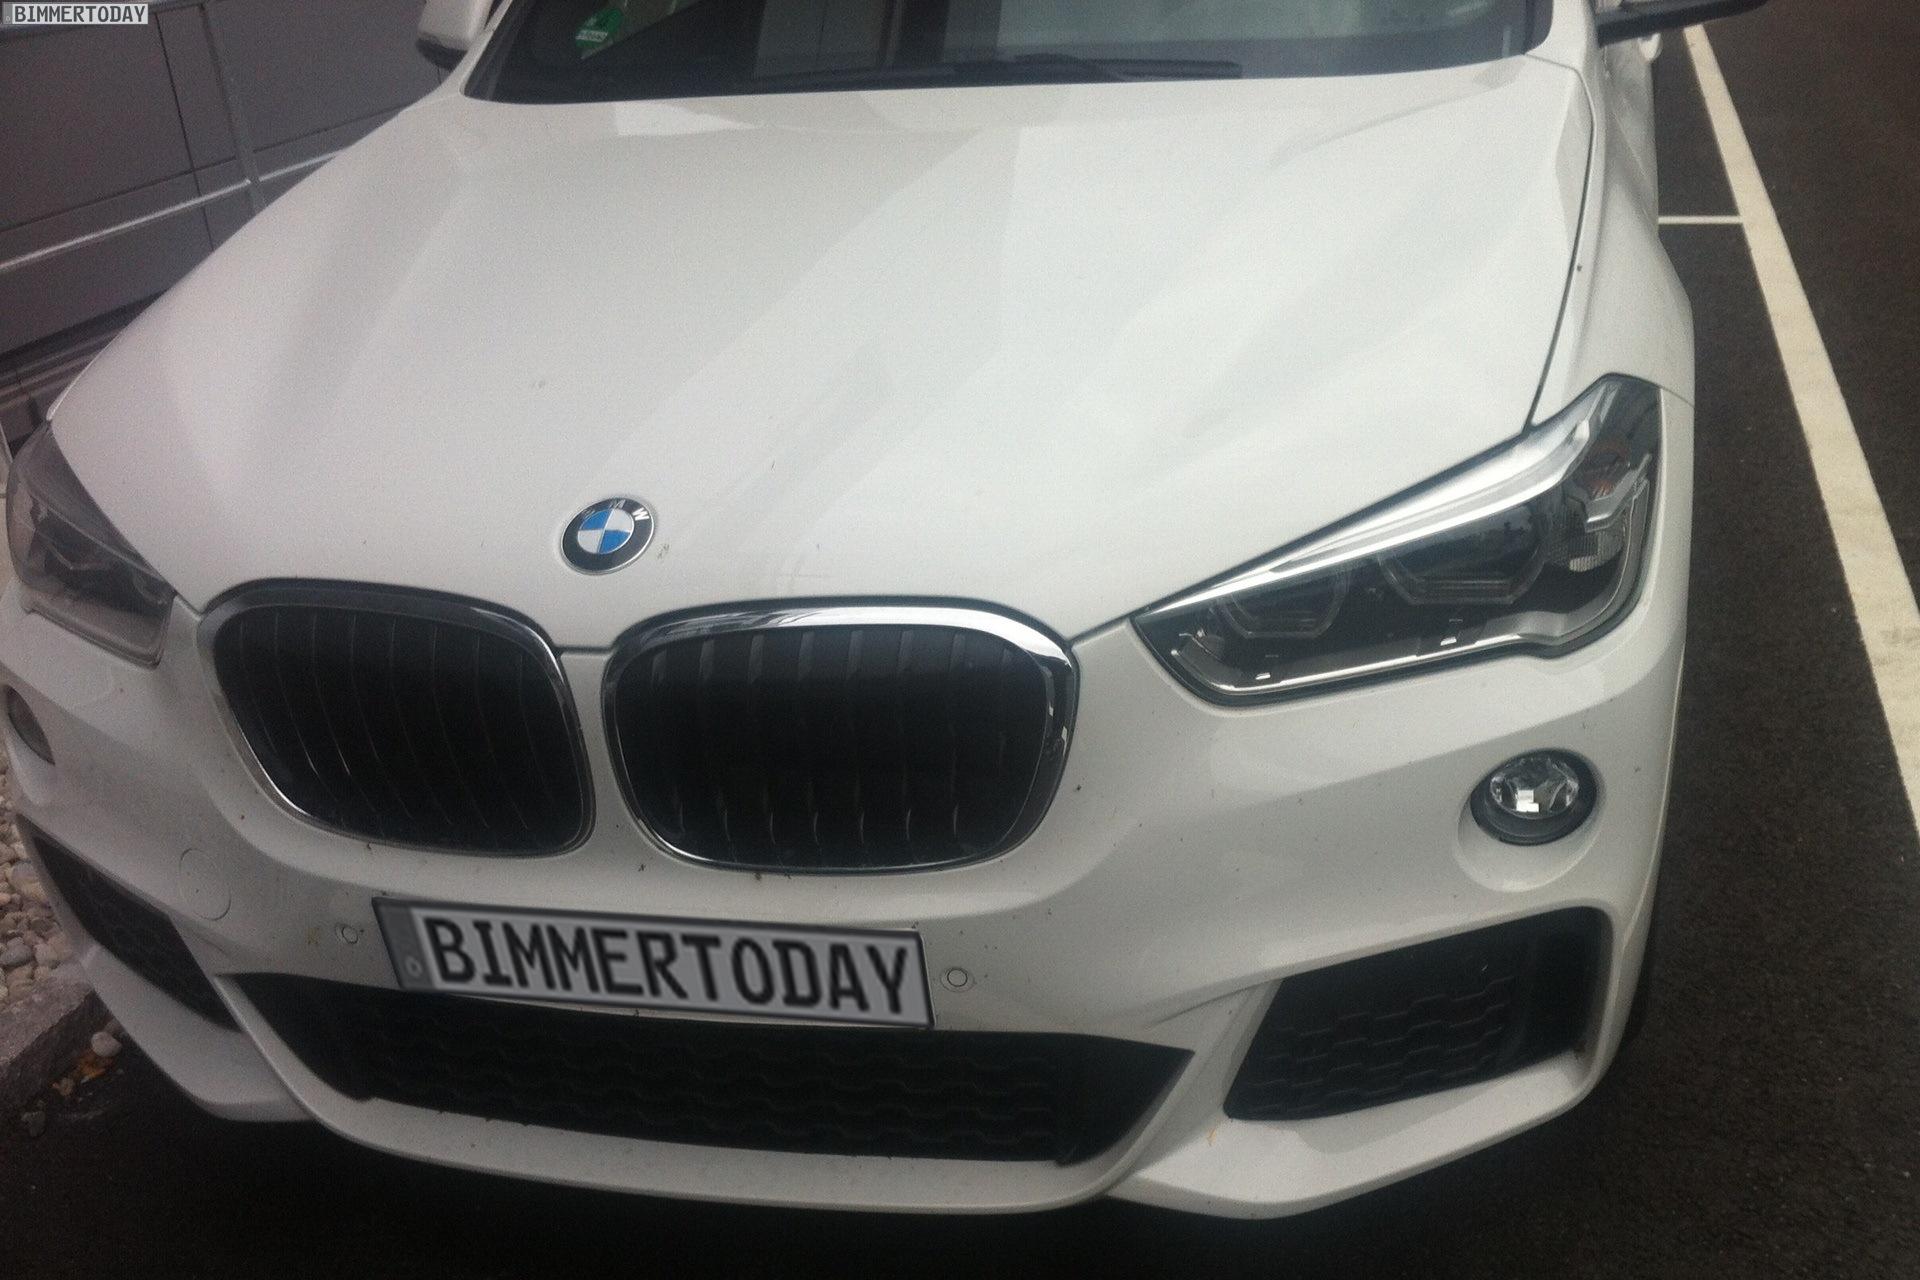 2015 BMW X1 M Sport Paket F48 Fotos weiss 01